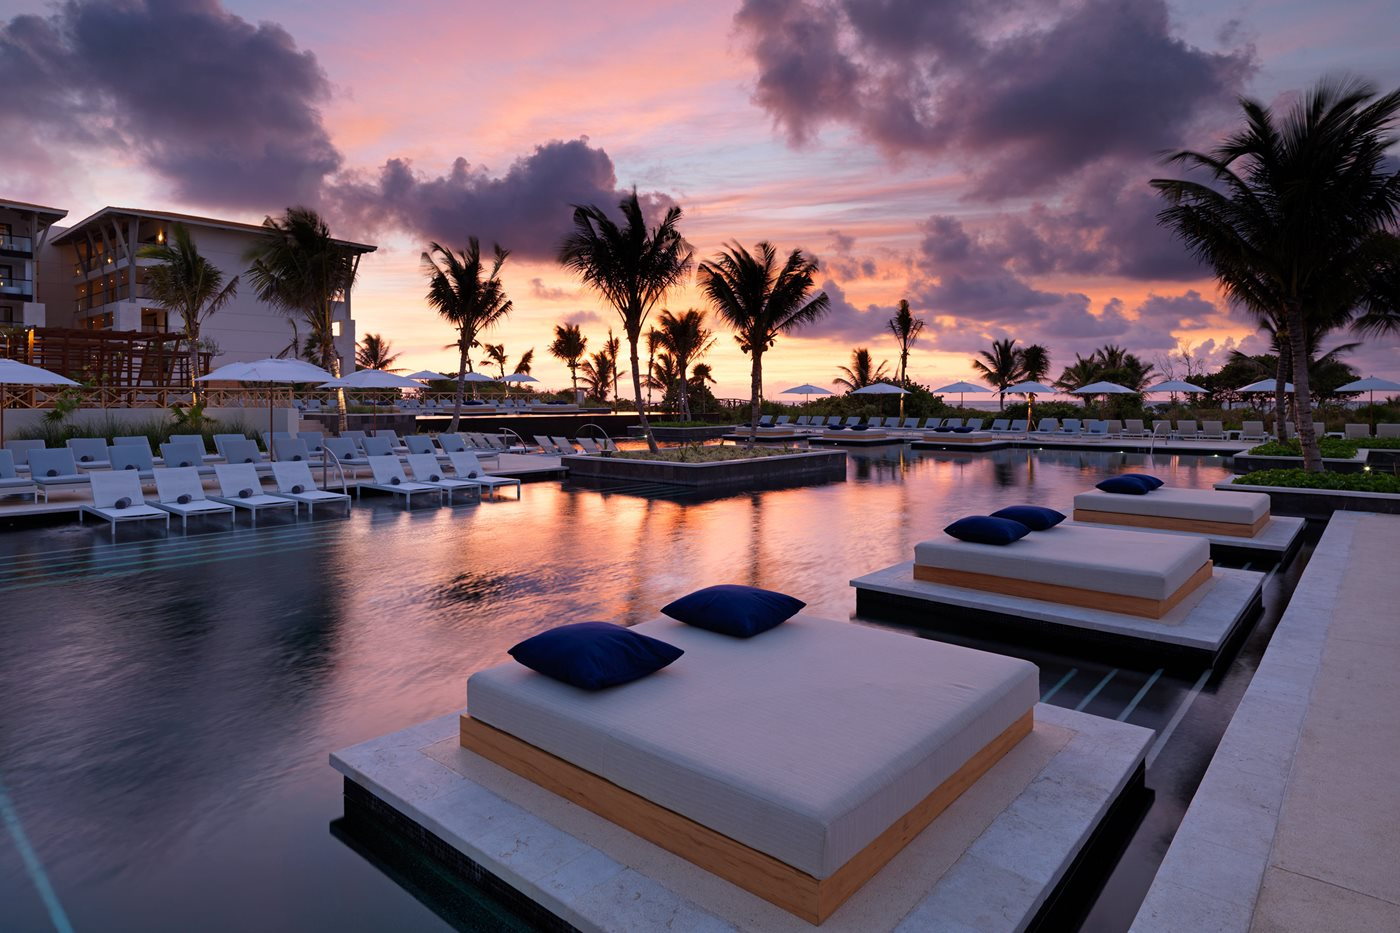 Unico-Riviera-Maya-Pool-001-AR